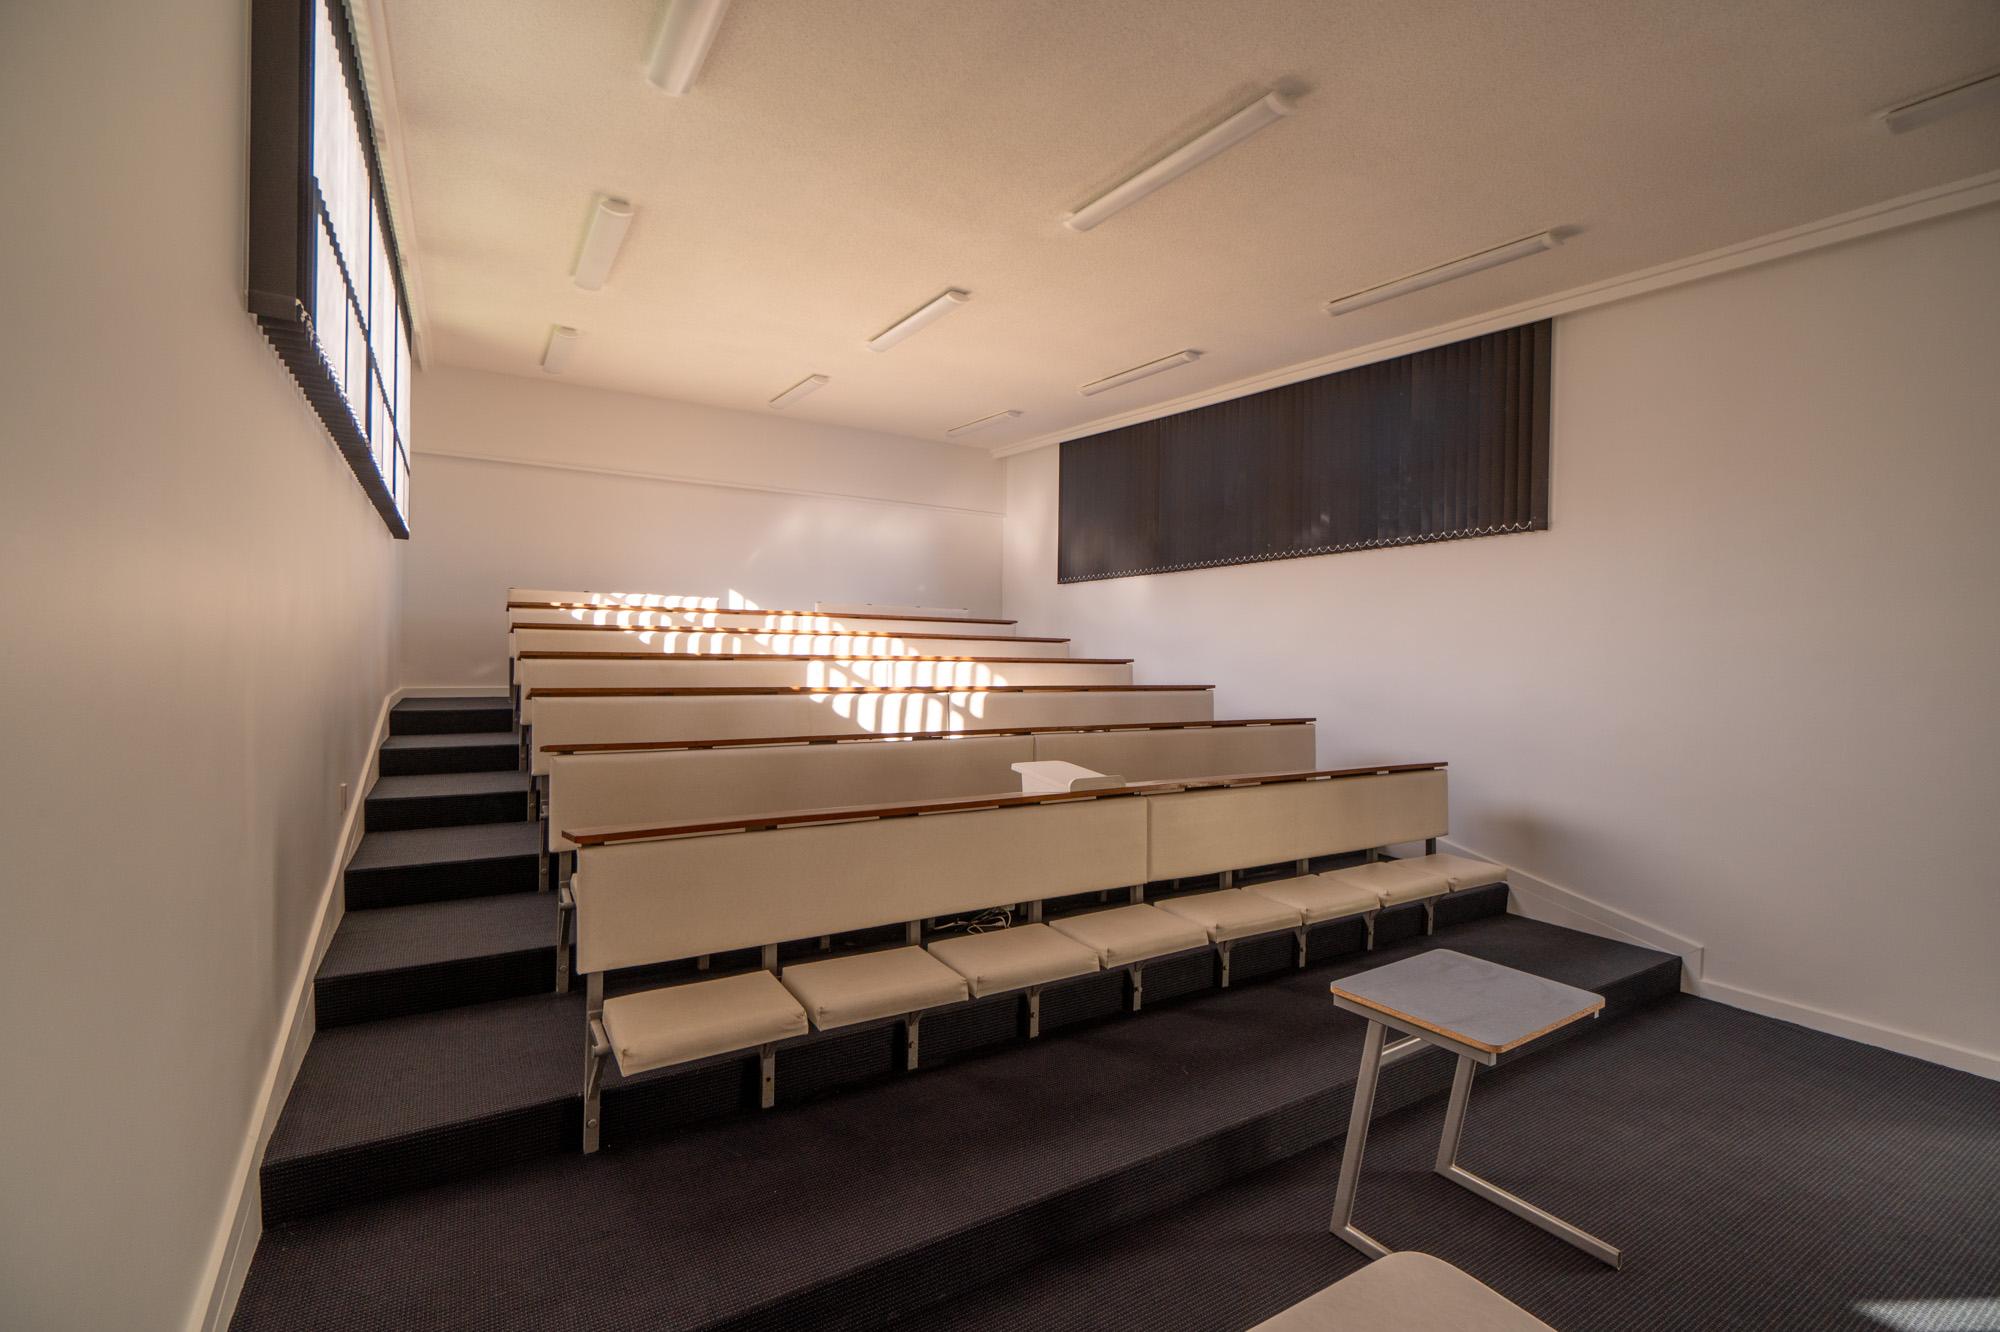 Innovation Auditorium